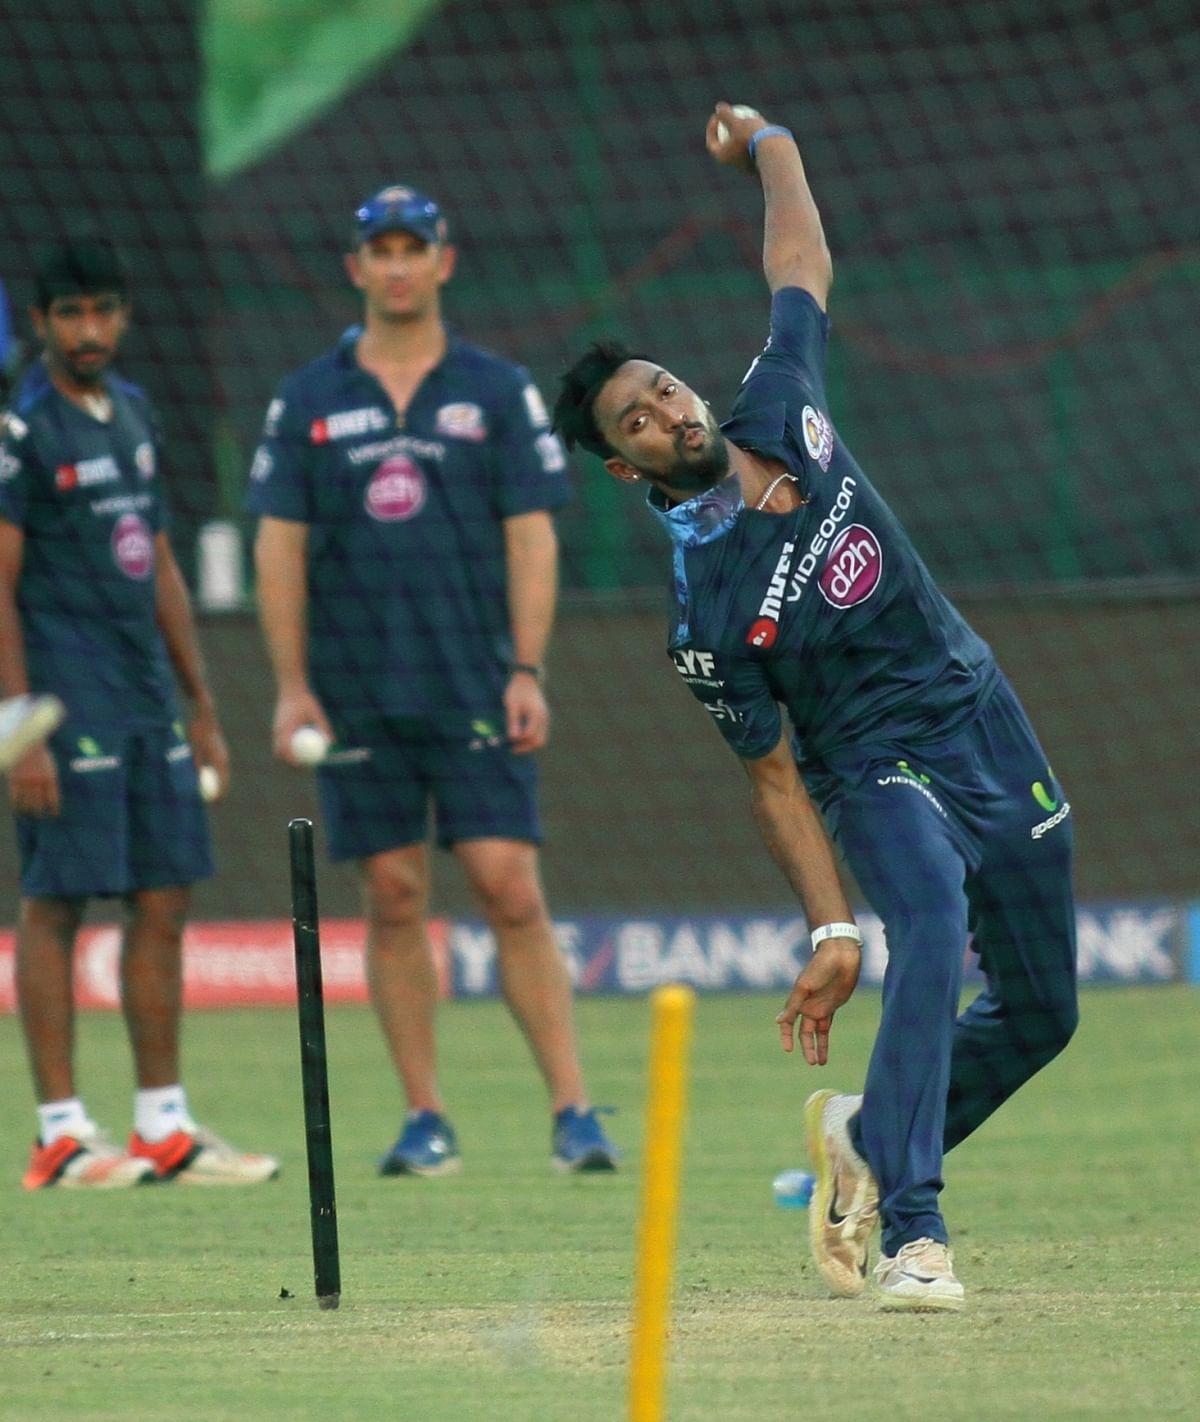 Krunal Pandya of the Mumbai Indians at a practice session. (Photo: IANSPhoto)